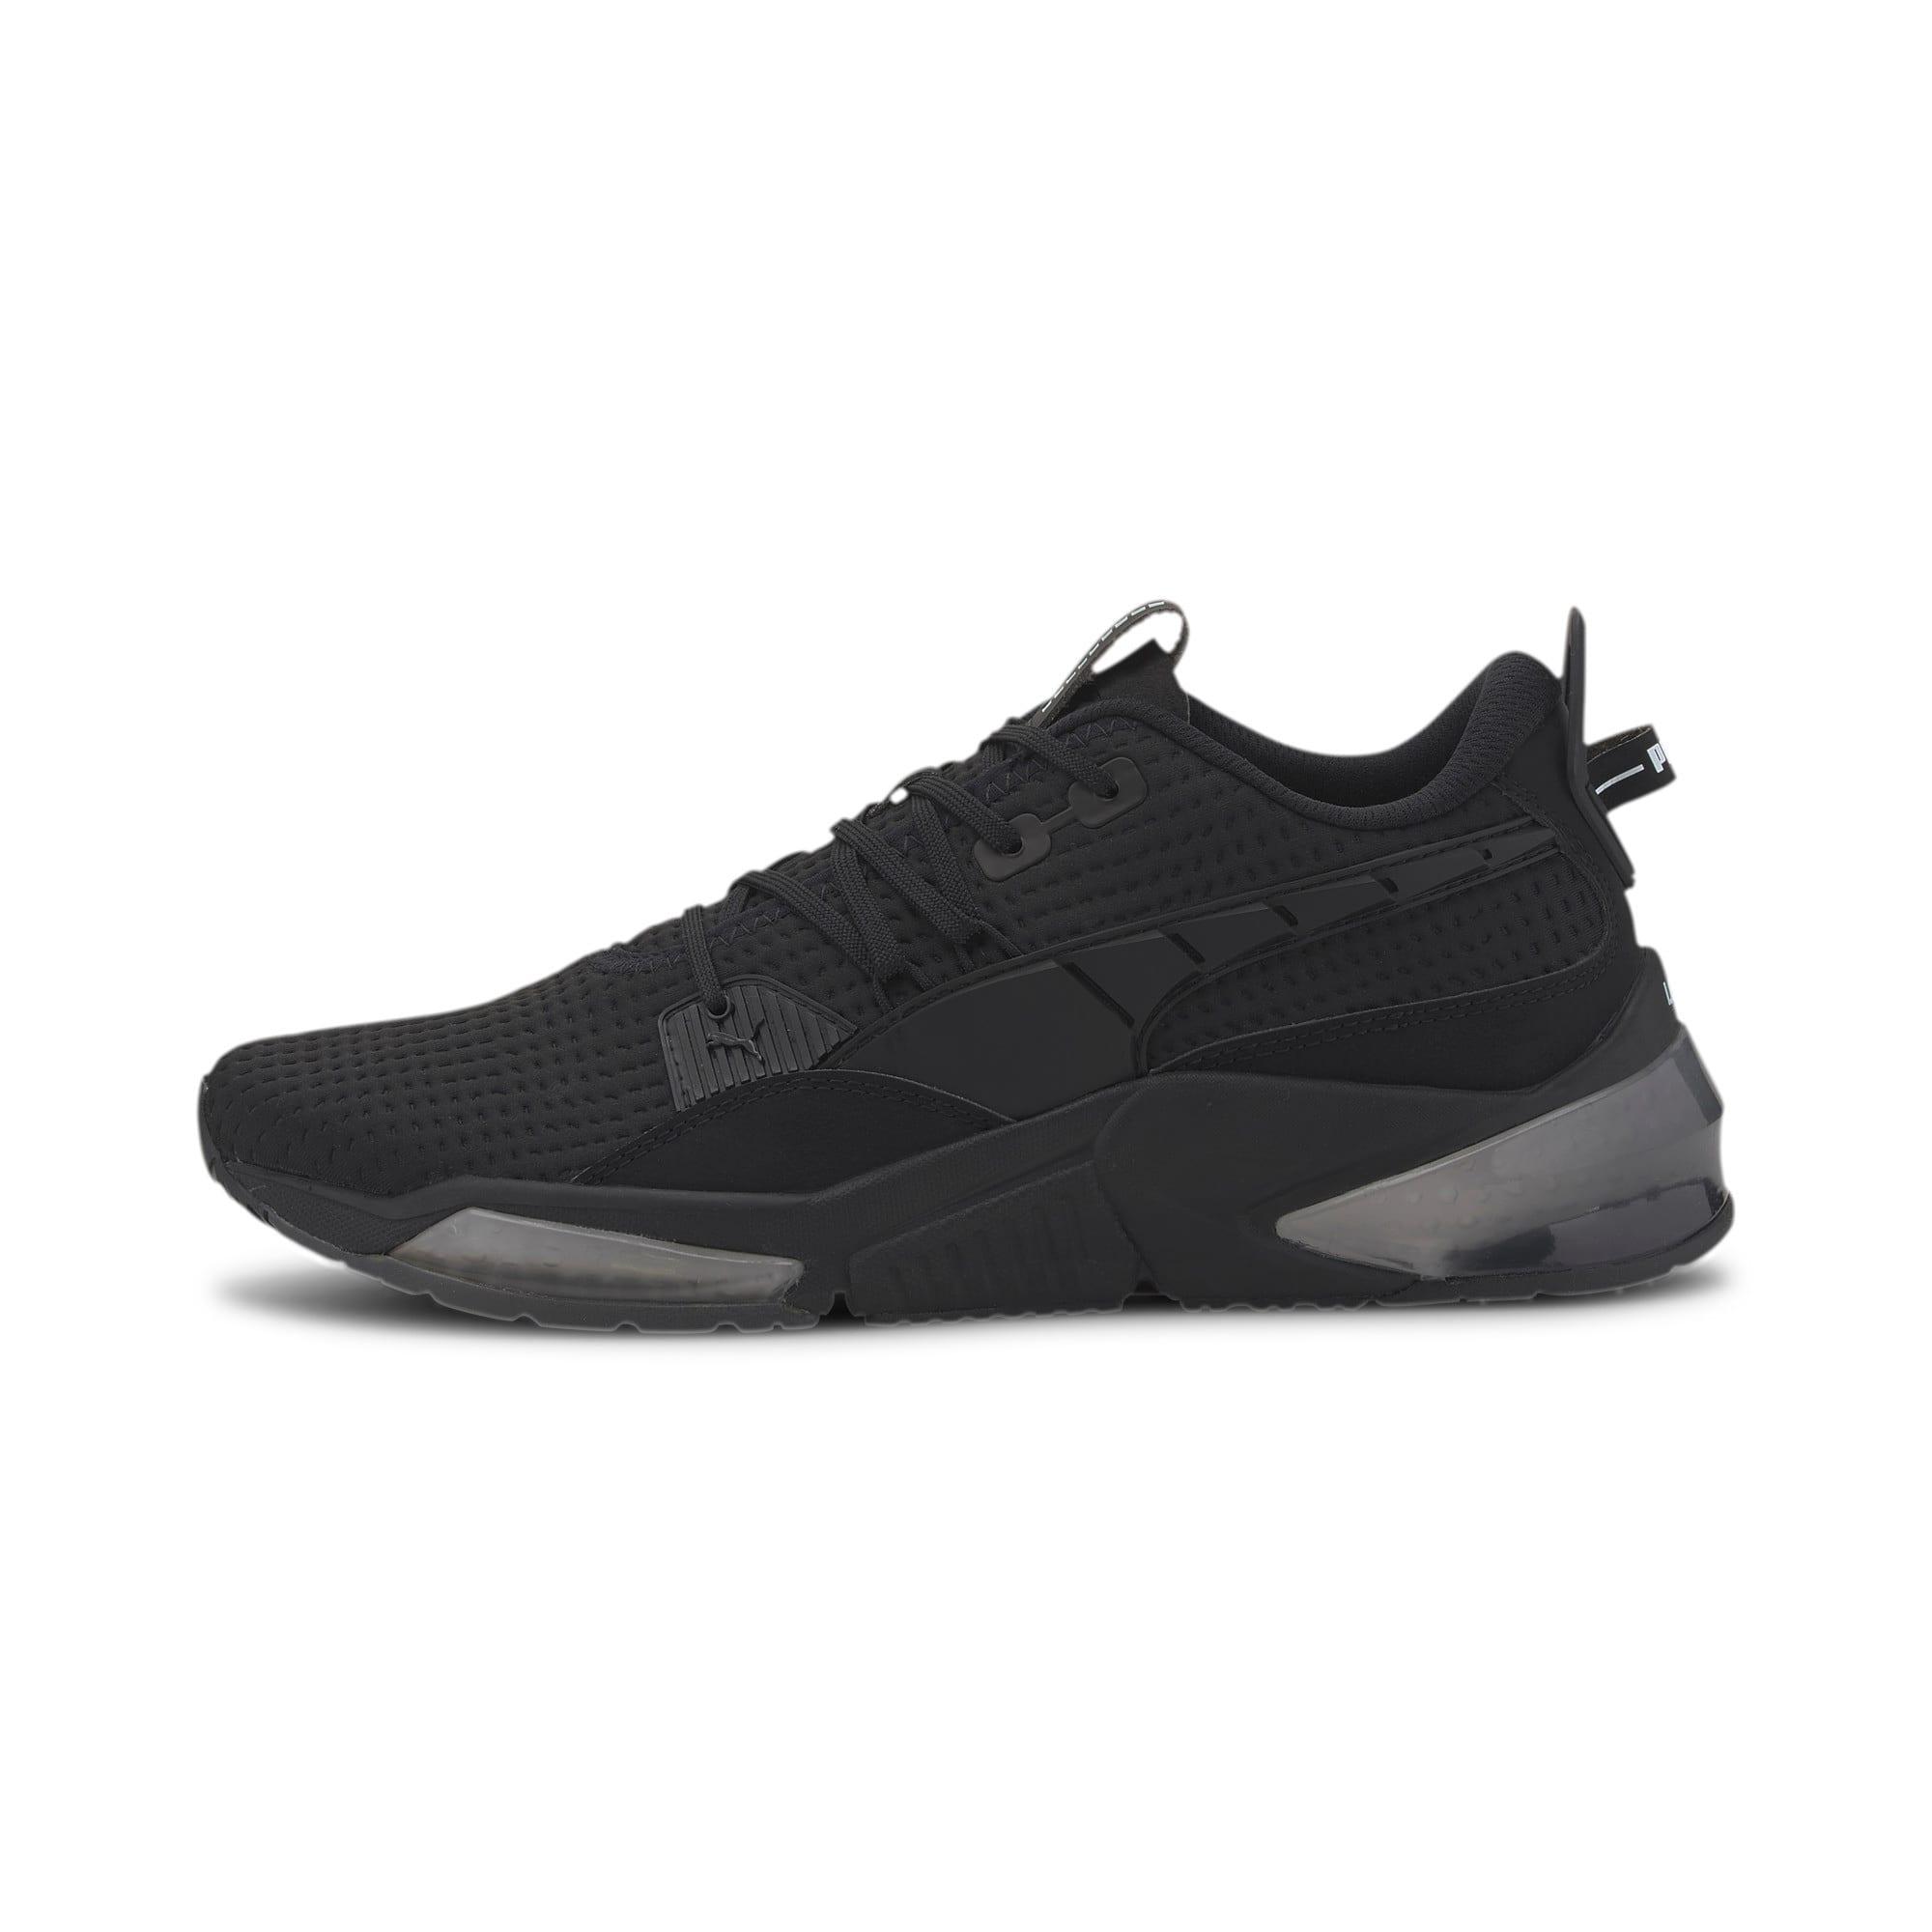 Thumbnail 1 of LQDCELL Optic Flight Suit Men's Training Shoes, Puma Black, medium